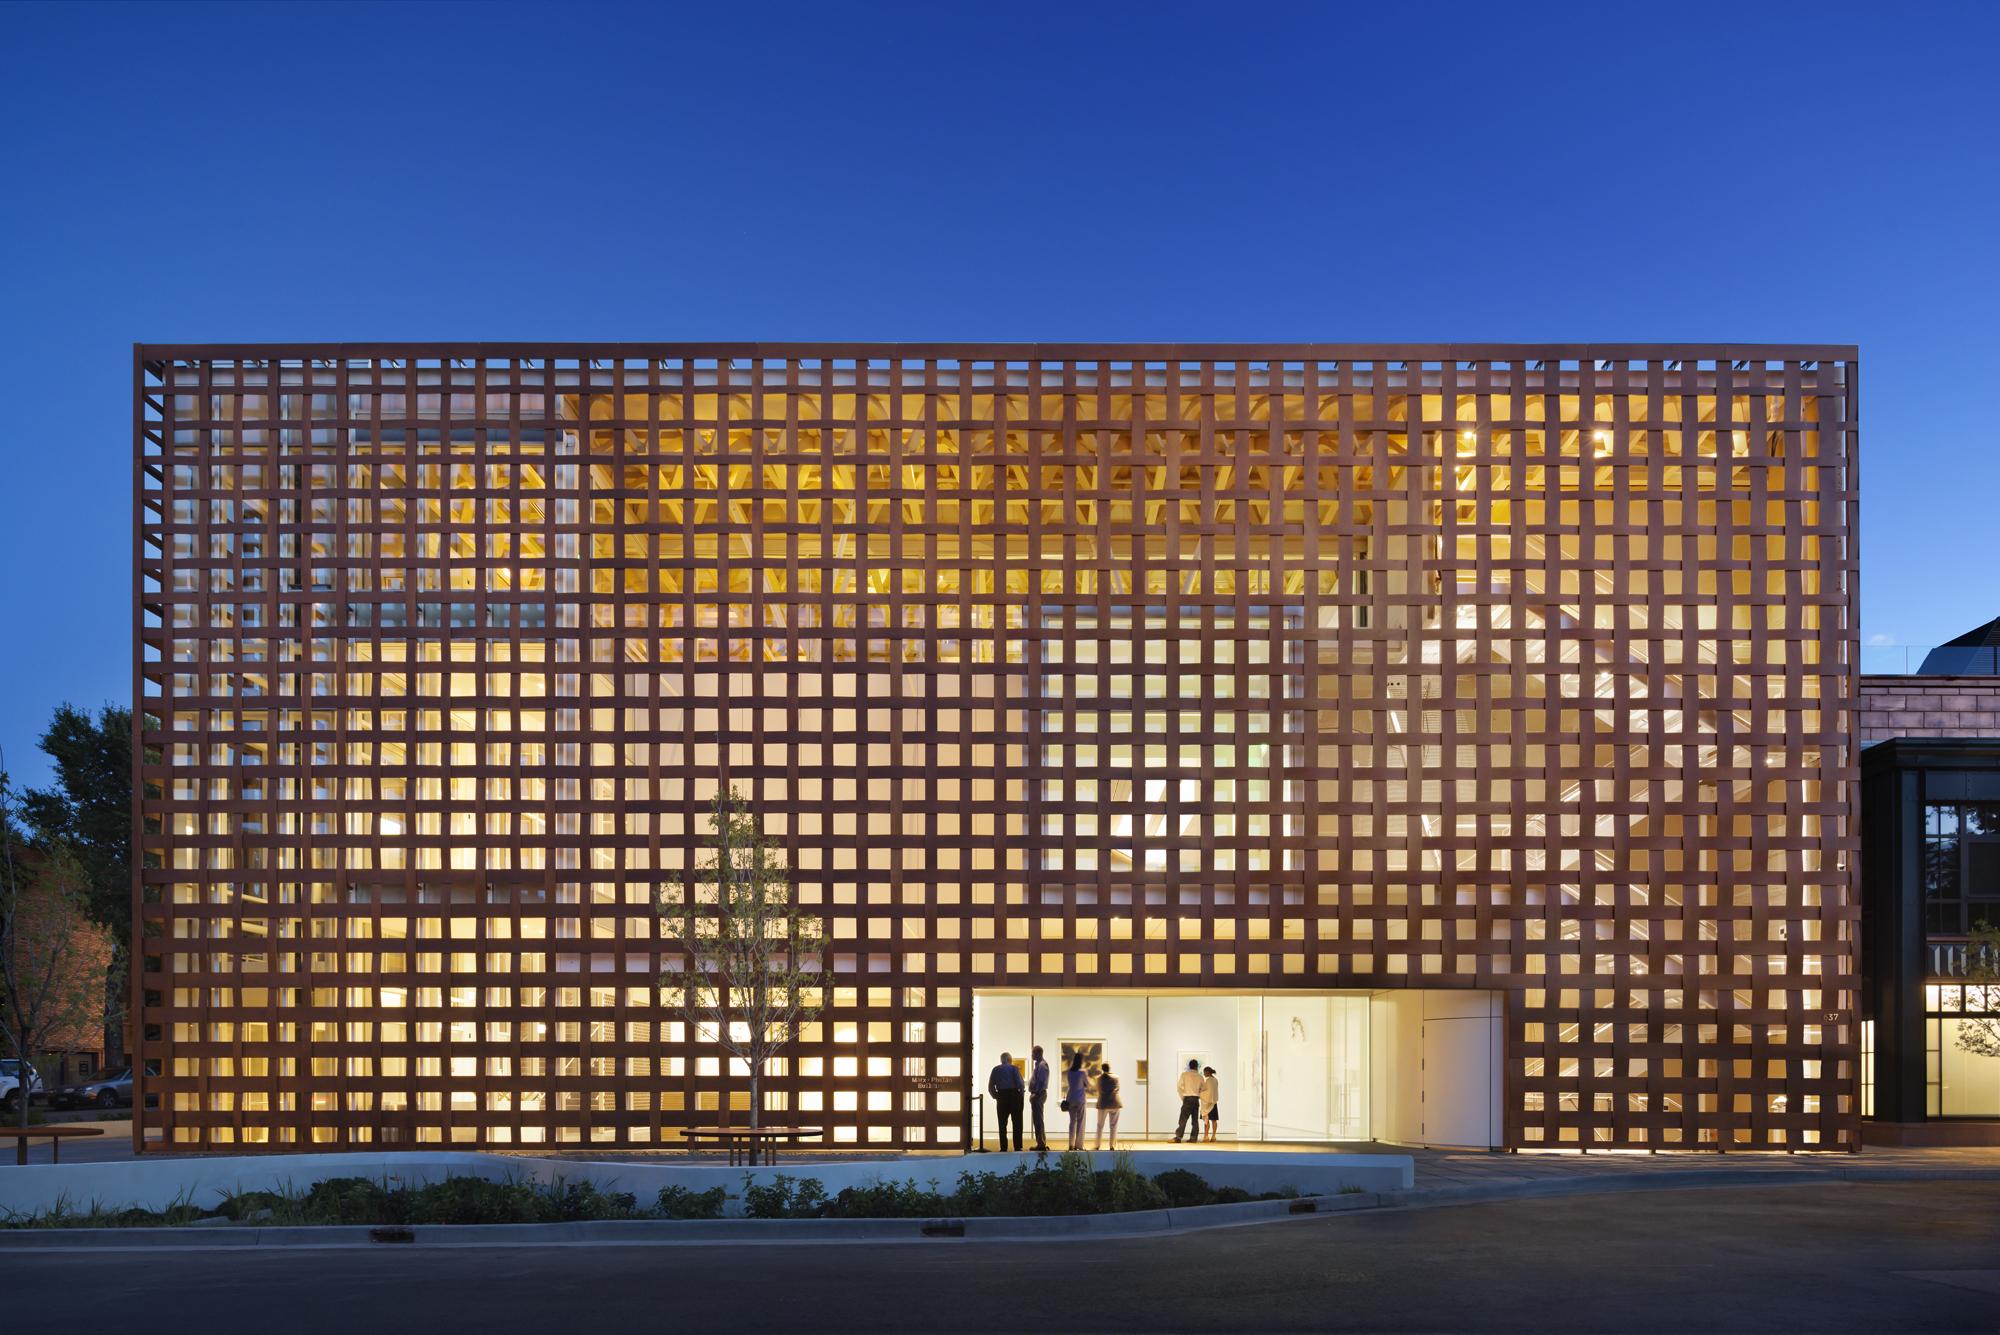 Shigeru ban architects museo de arte aspen hic for Architecture ephemere shigeru ban